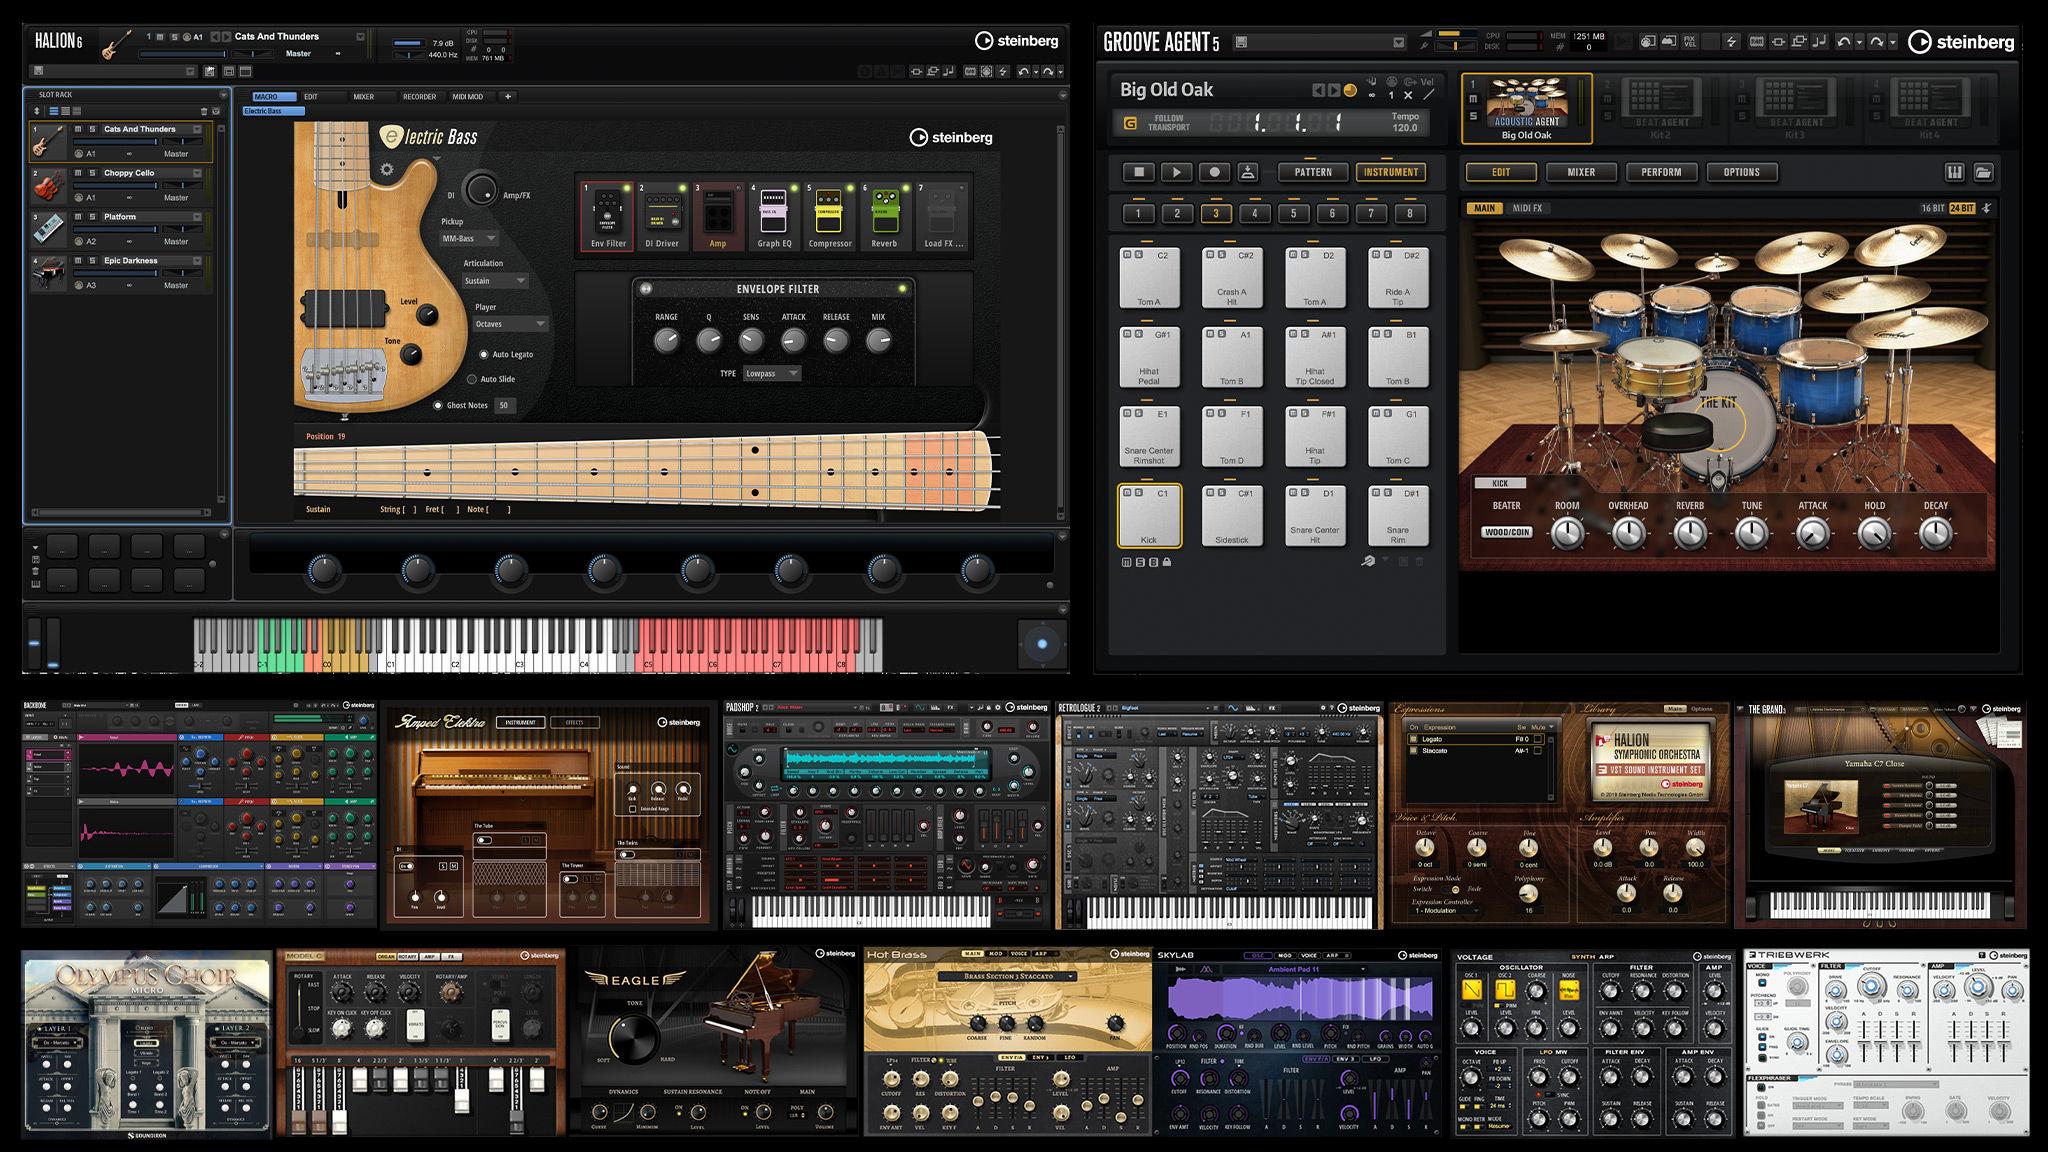 Steinberg Absolute 5 Collection Mac 破解版 最佳虚拟乐器